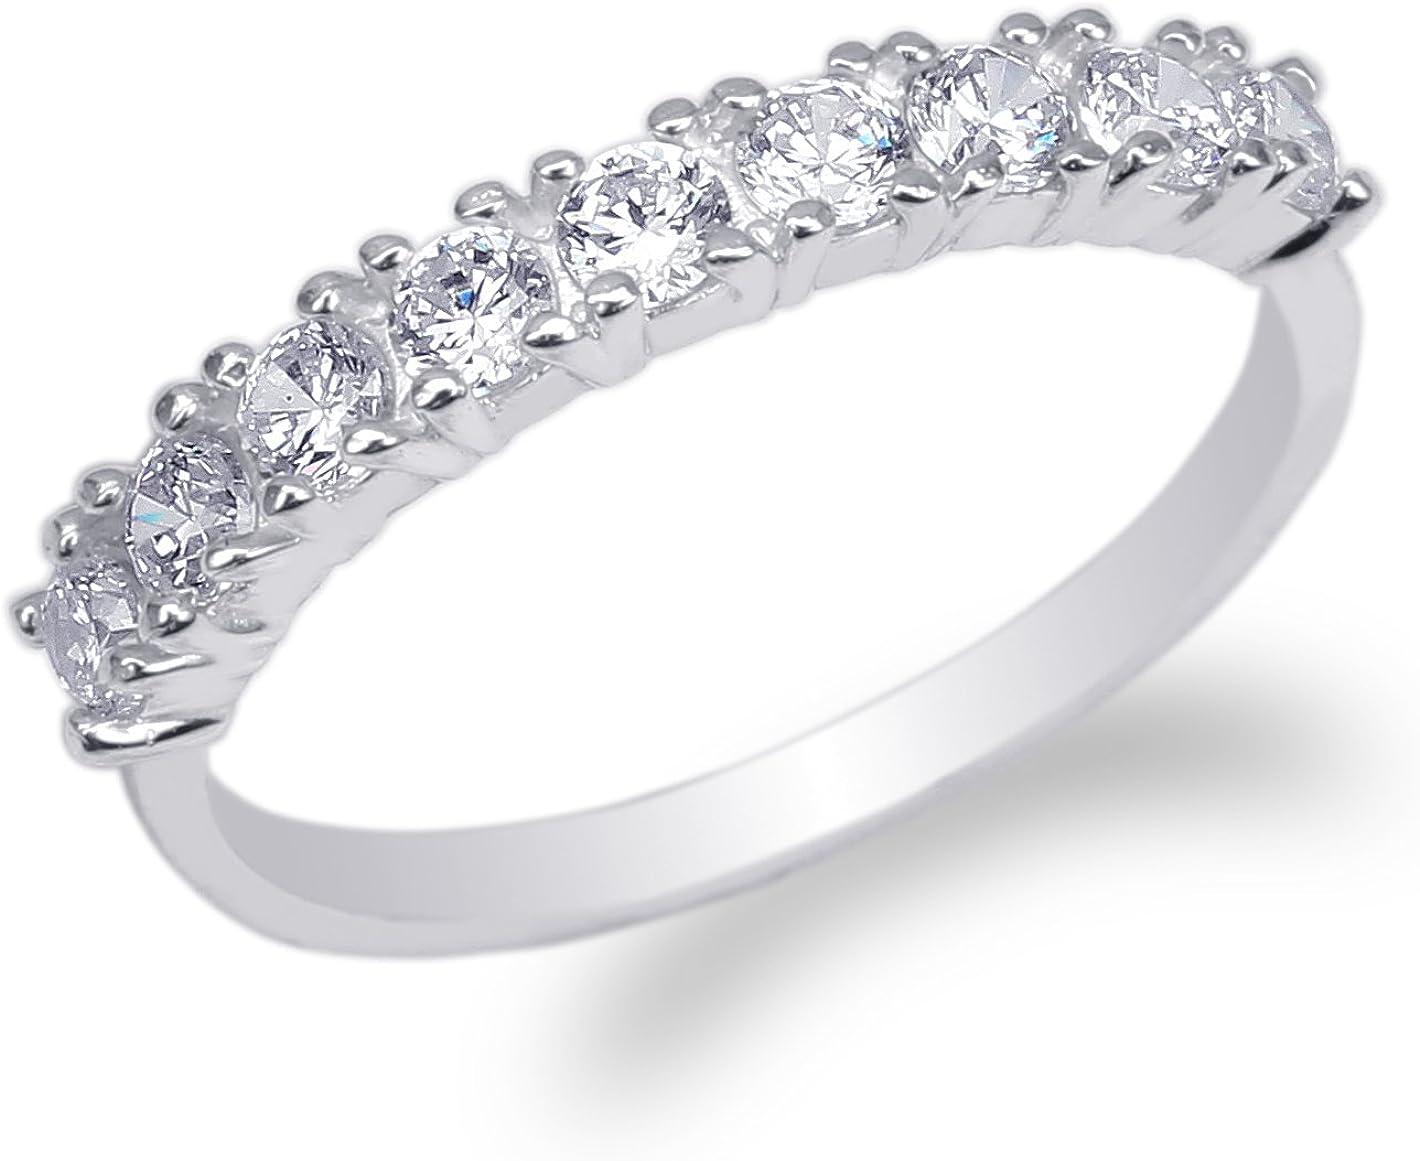 JamesJenny Womens 10K White Gold Round CZ Beautiful Eternity Band Ring Size 4-9